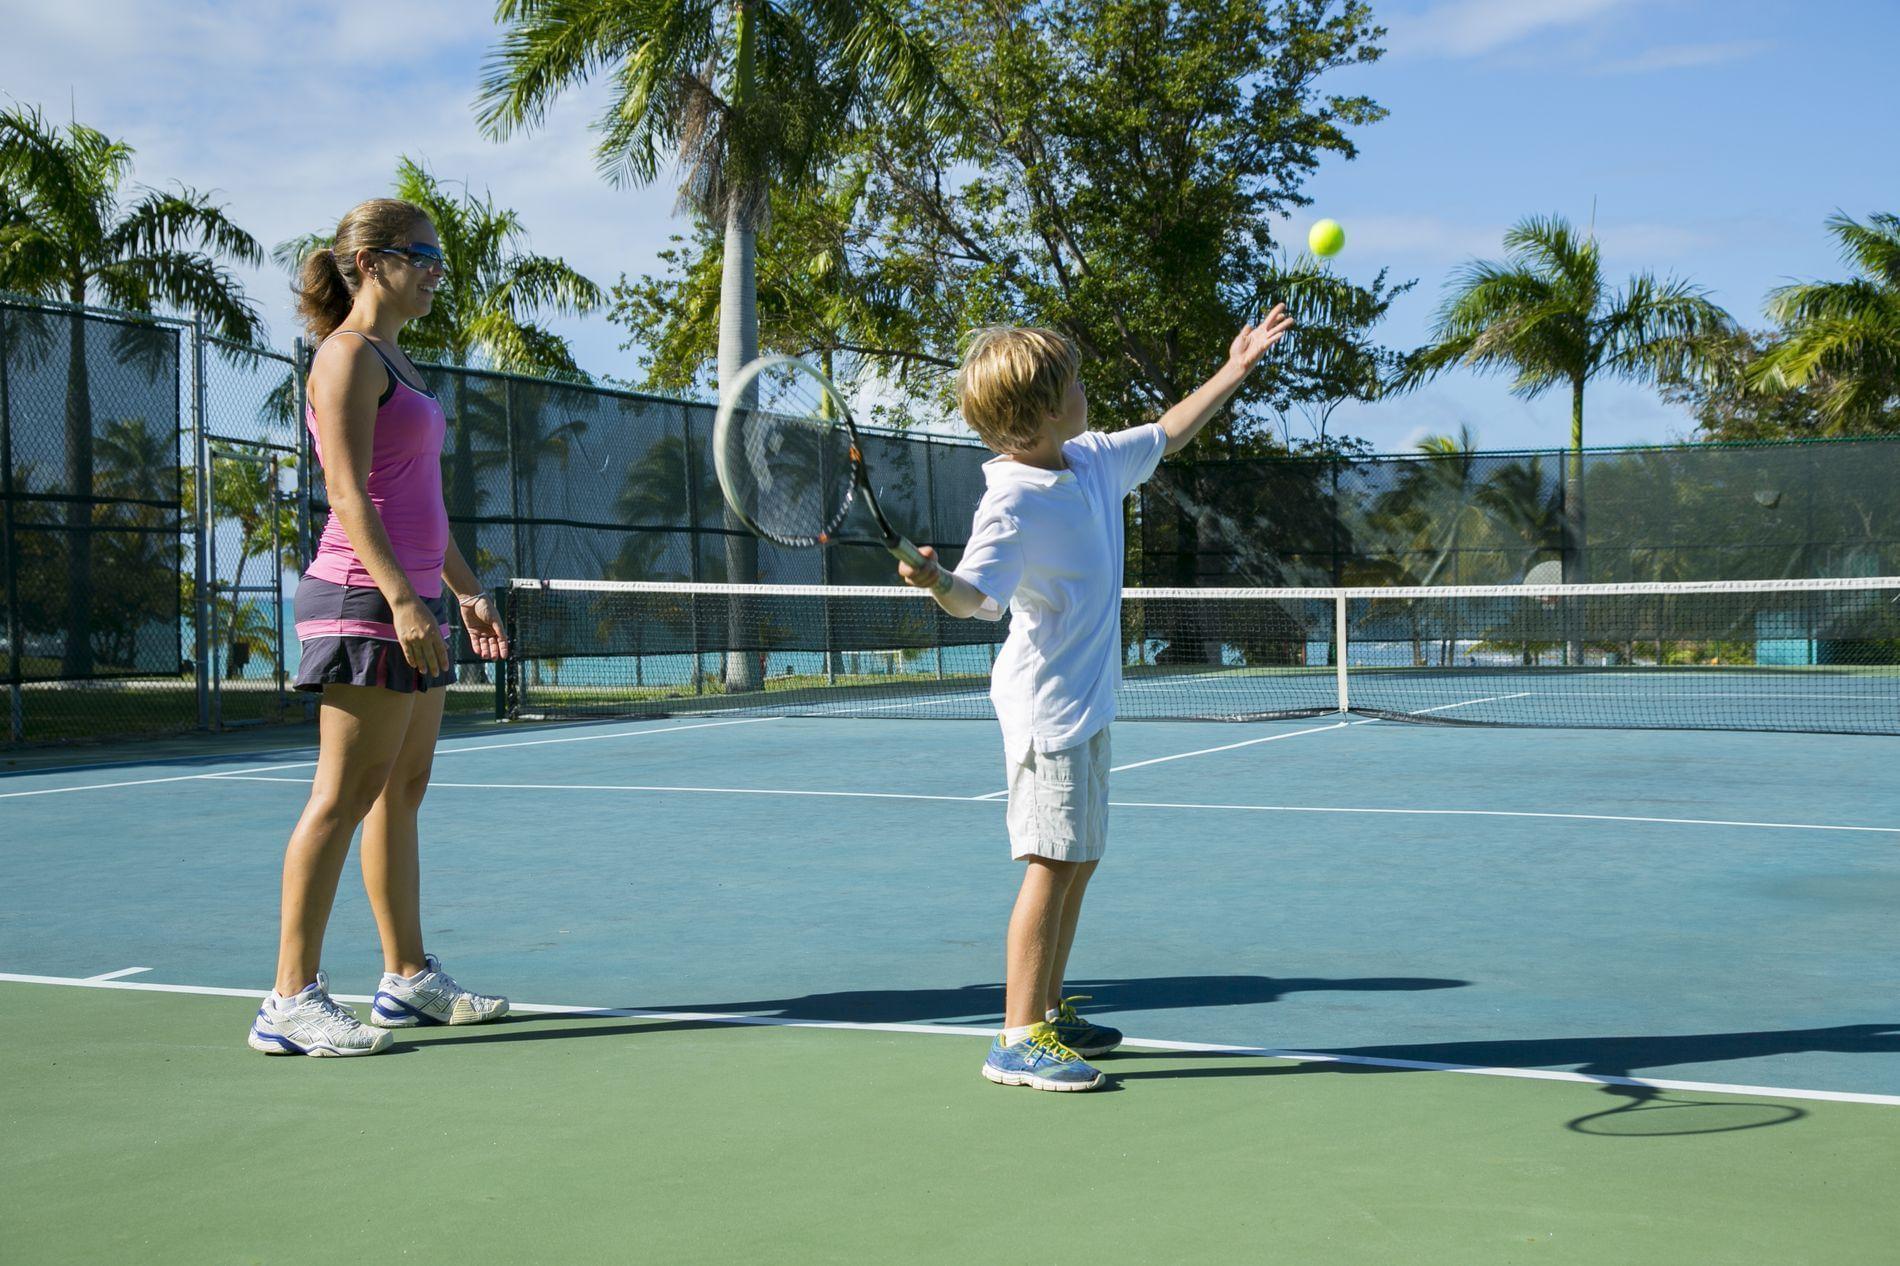 Mom & son playing tennis